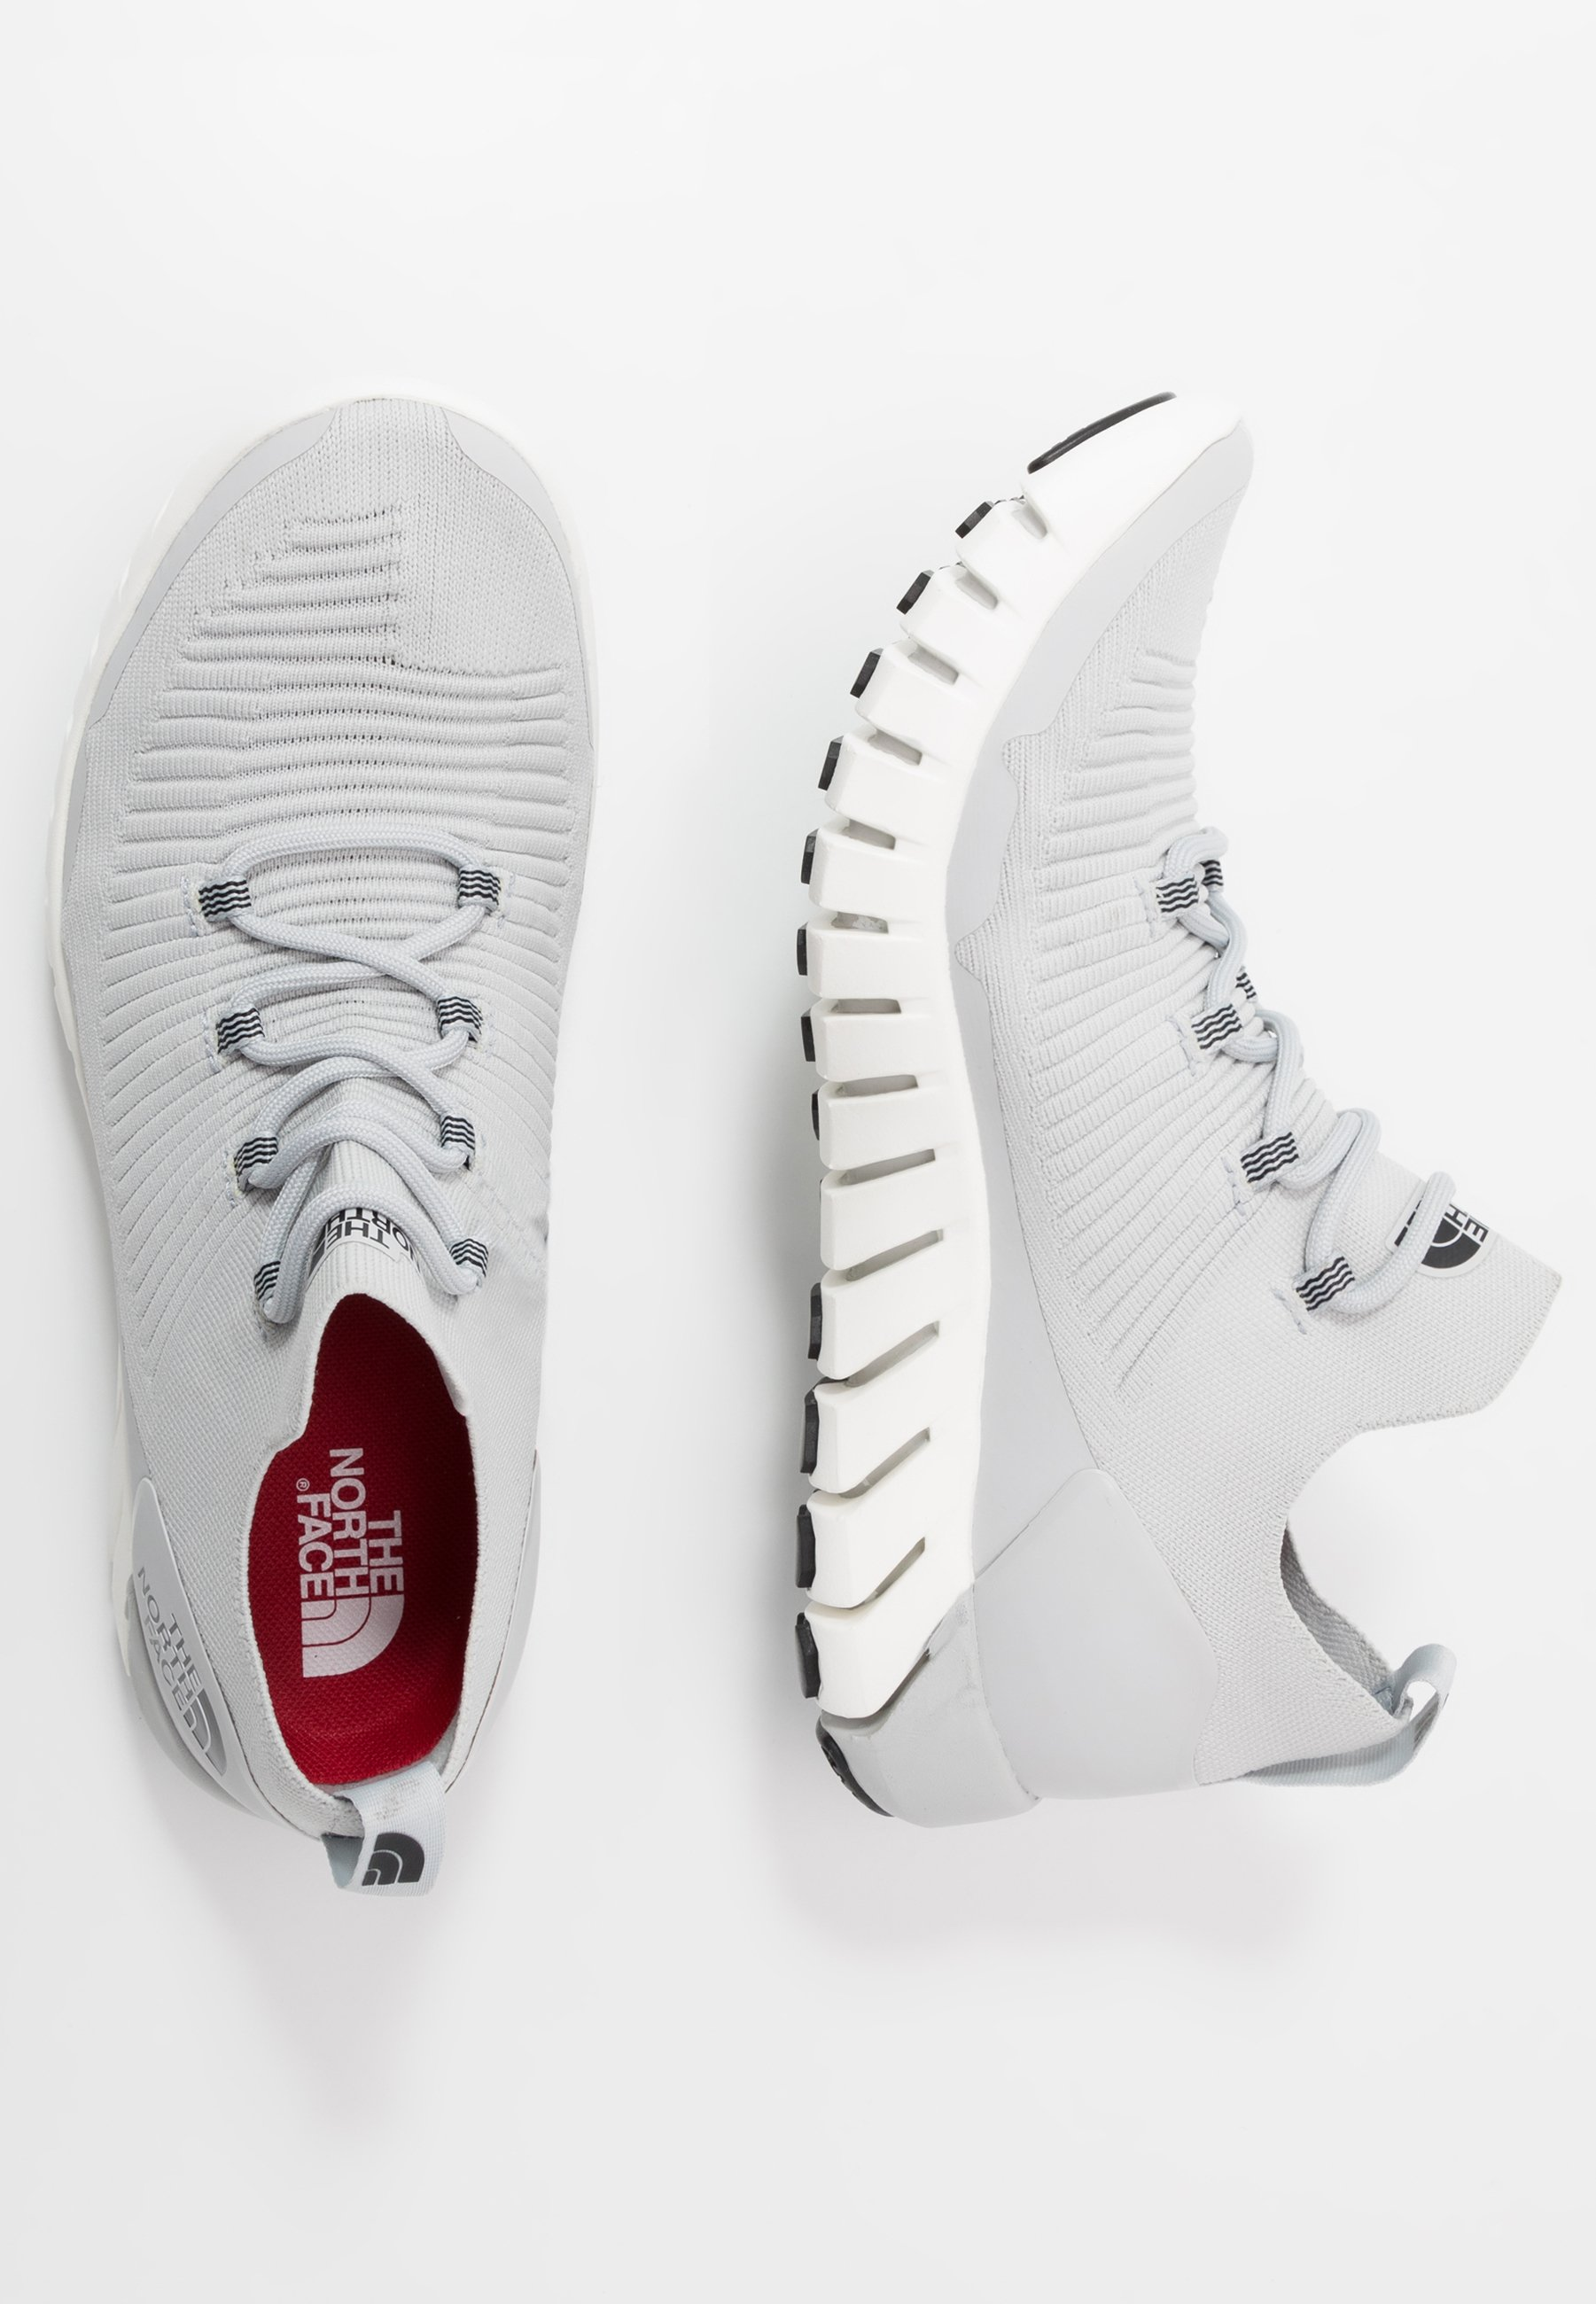 The North Face MEN'S OSCILATE Sportieve wandelschoenen